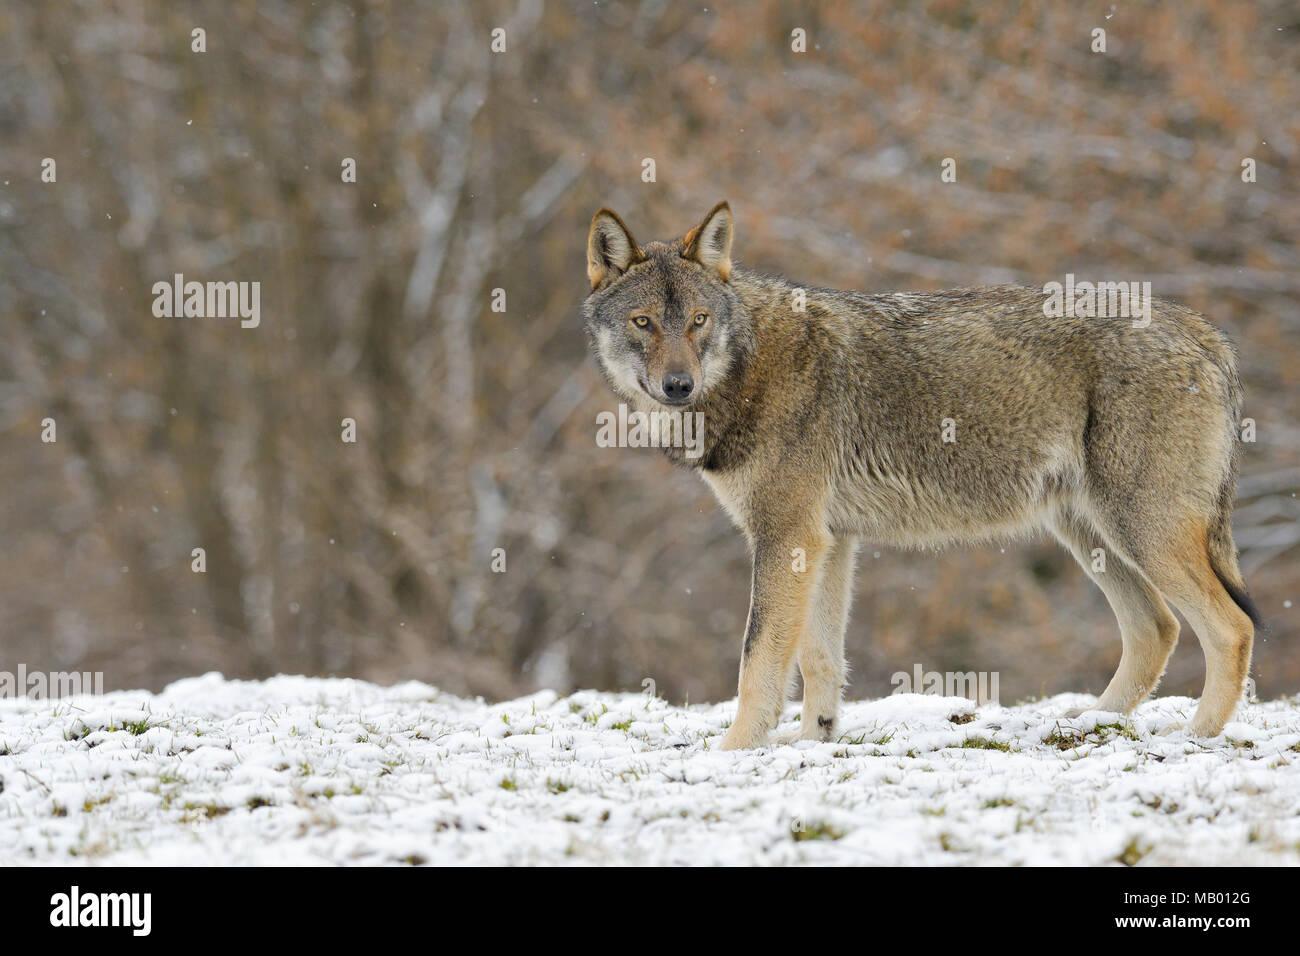 Winter in polen stockfotos & winter in polen bilder alamy